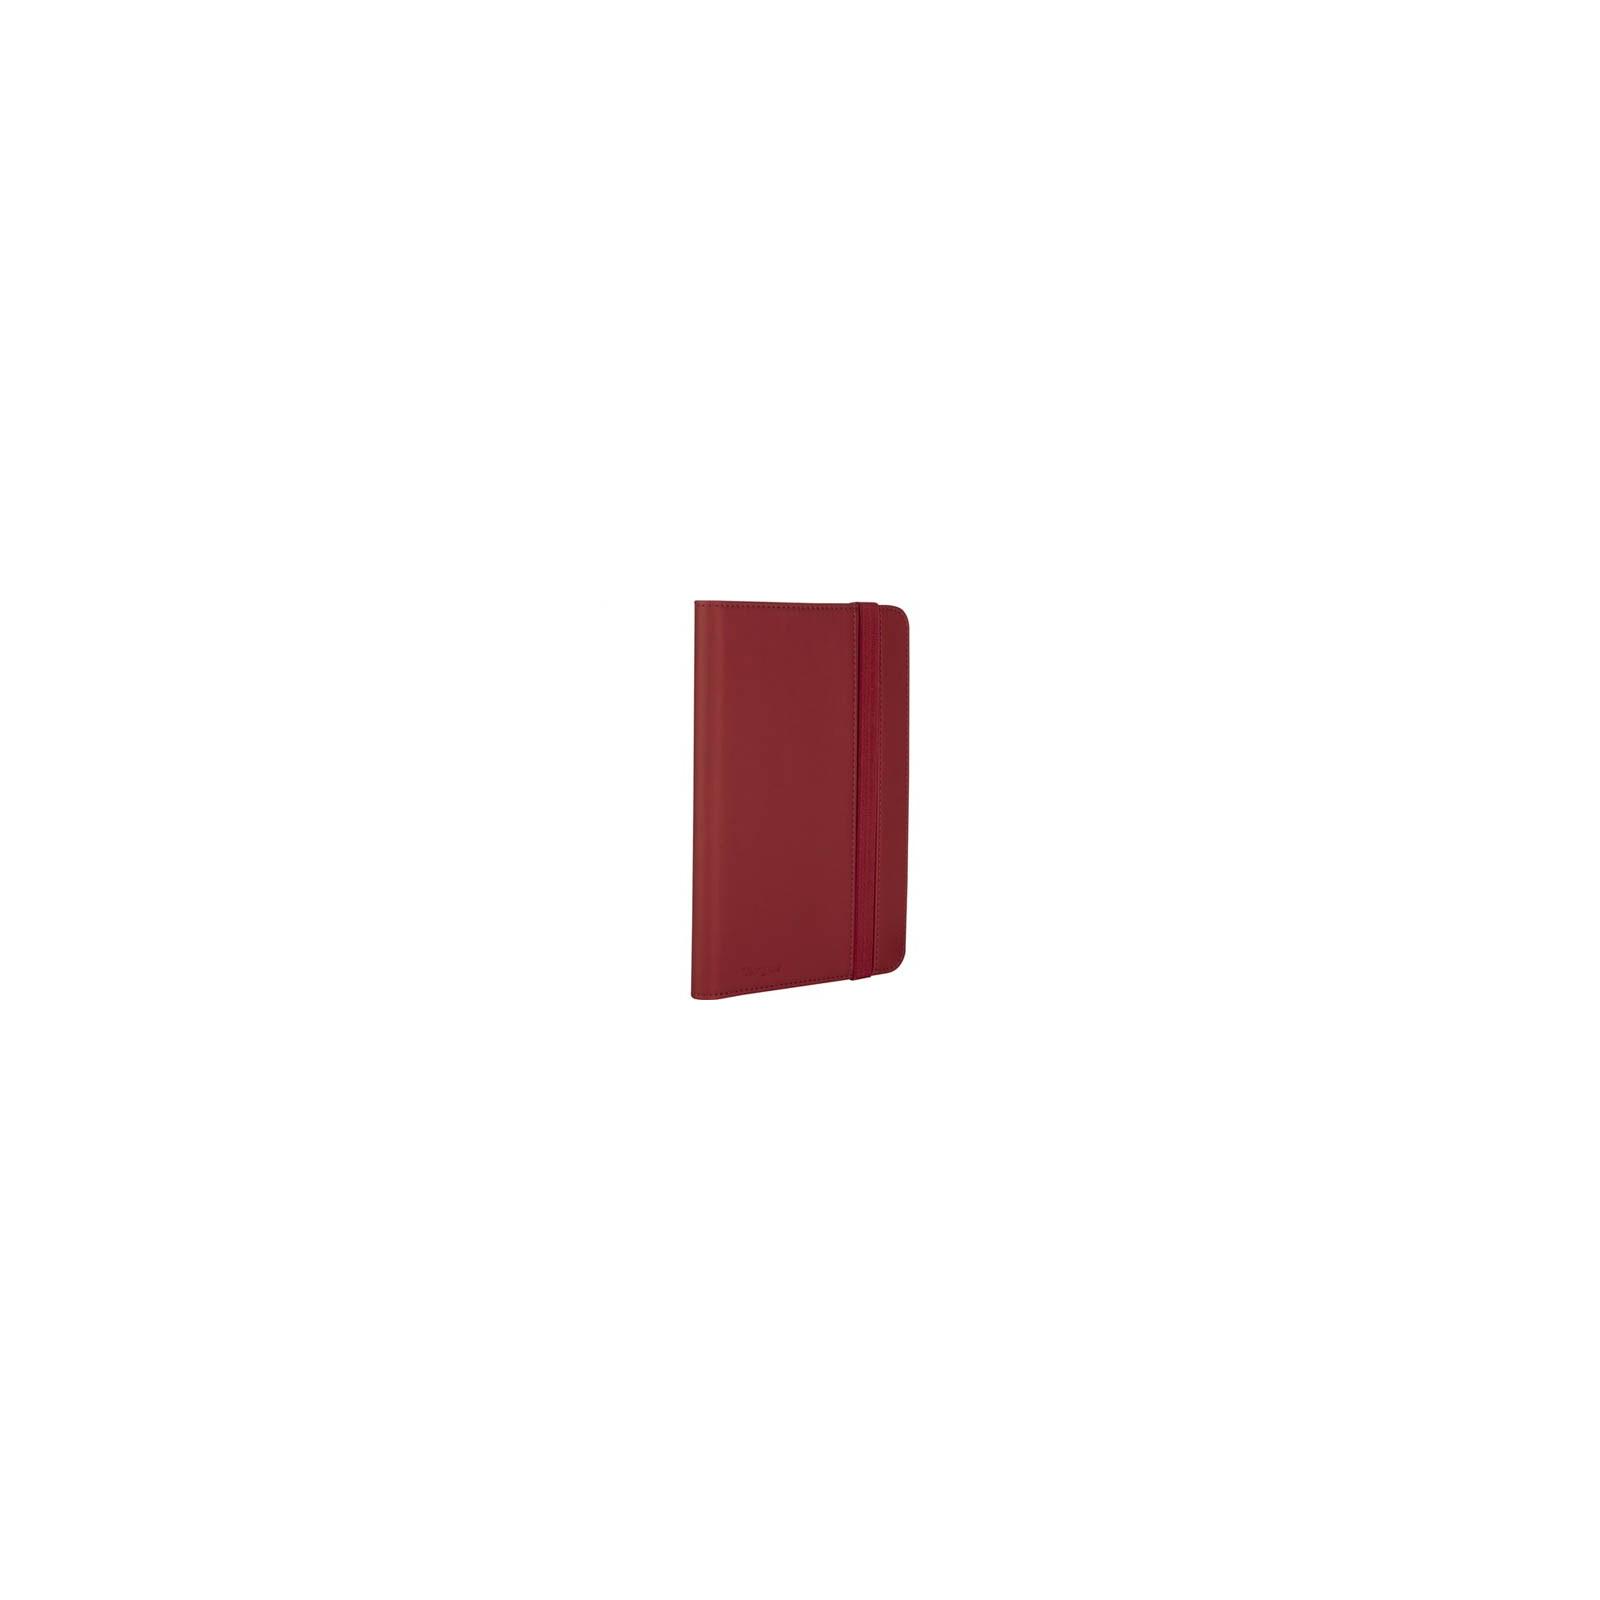 Чехол для планшета Targus 7 Galaxy Tab/Tab2/Tab3 Kickstand Protective Folio (THZ20602EU)